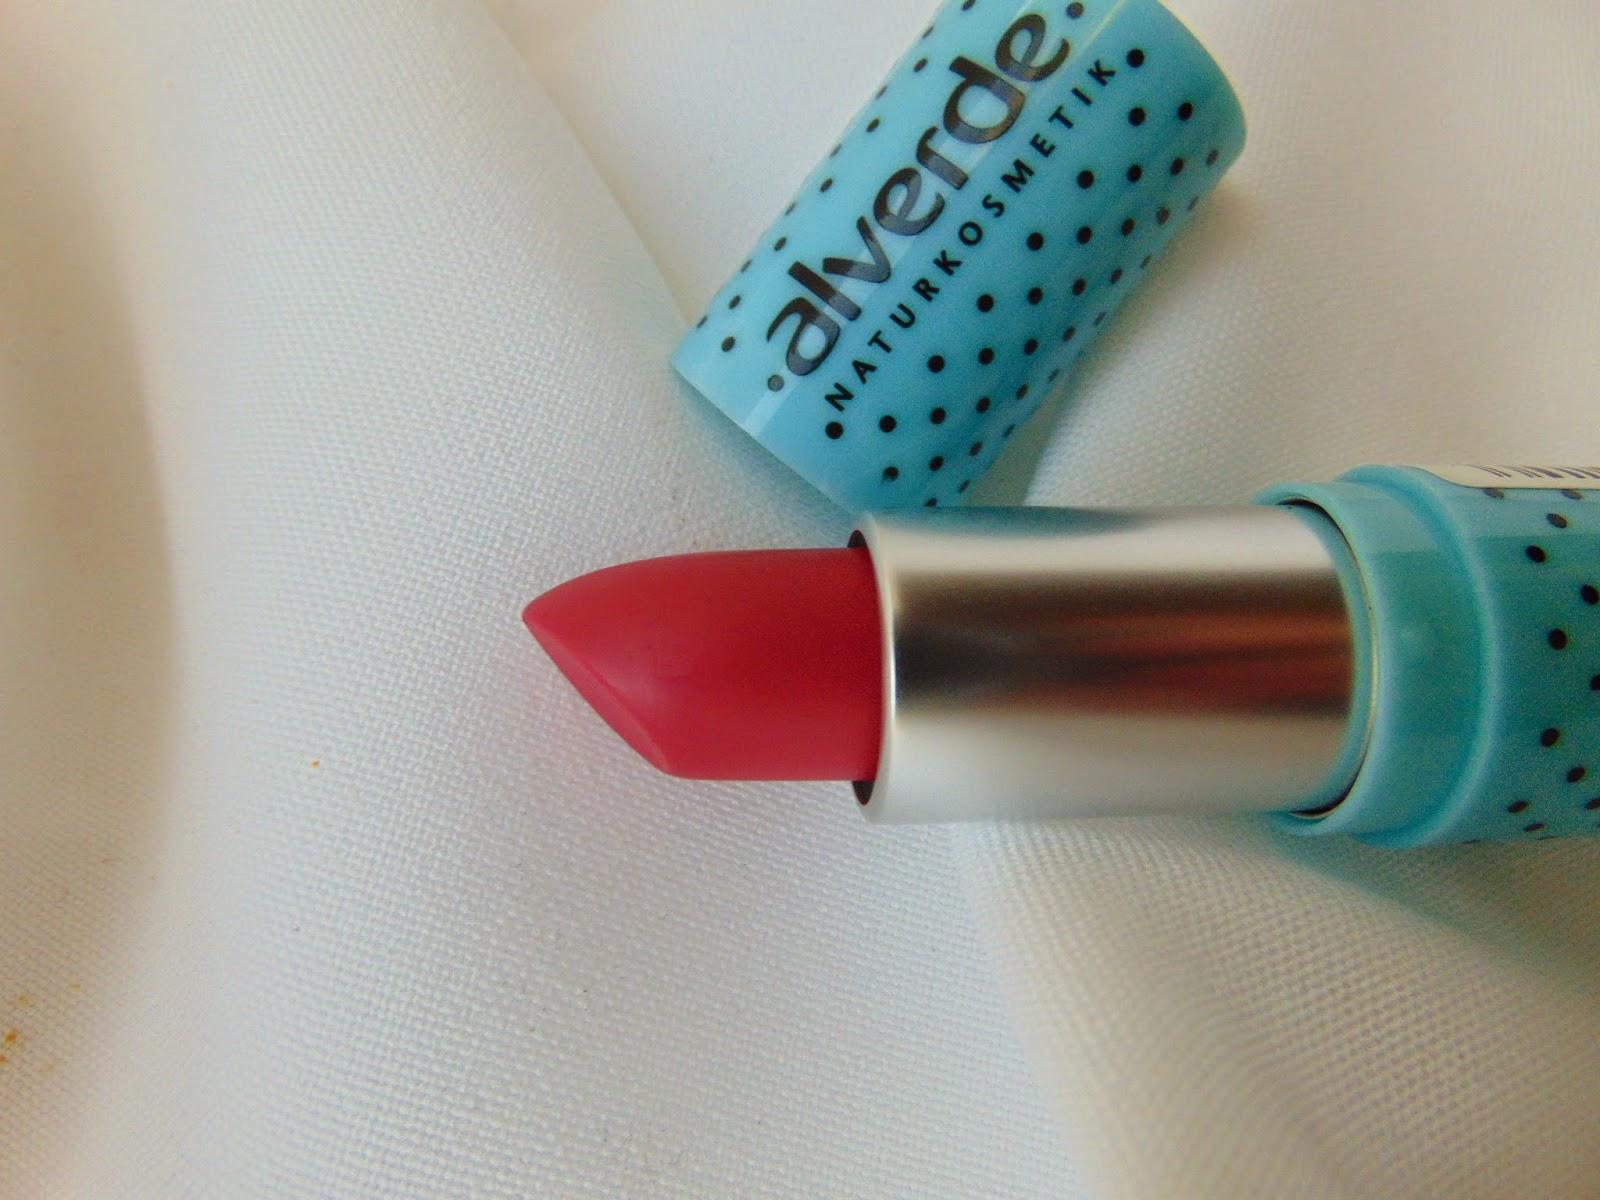 Alverde LE - Faboulus Fifties - Lippenstift - Dominant Pink 30 - www.annitschkasblog.de